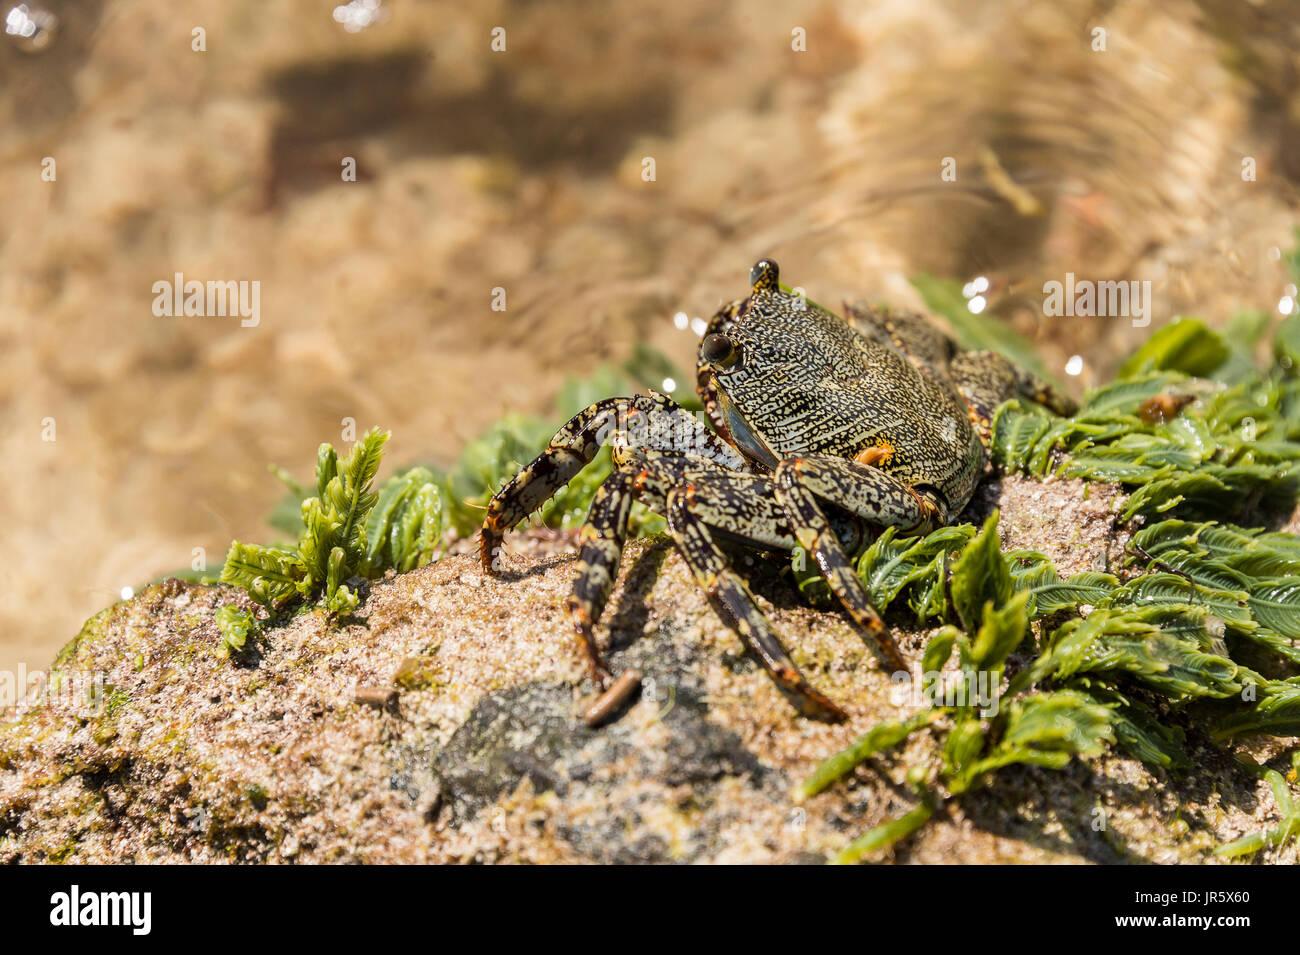 Zagaia (Grapsus sp.) sea crab on a rock in Martinique, Carribean. - Stock Image